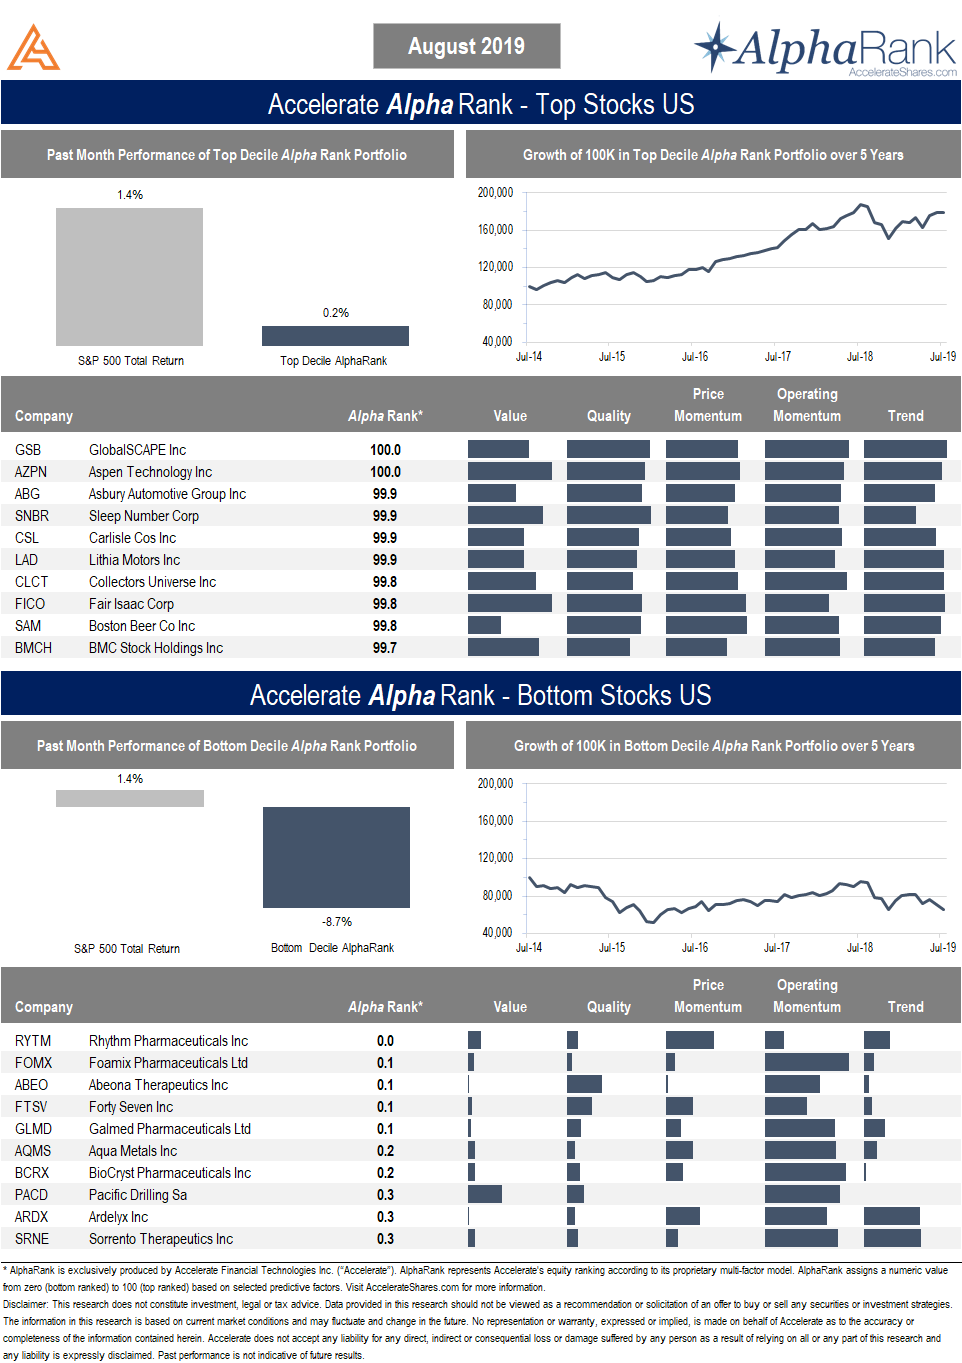 AlphaRank Top Stocks - August 2019 | Accelerate | Accelerate